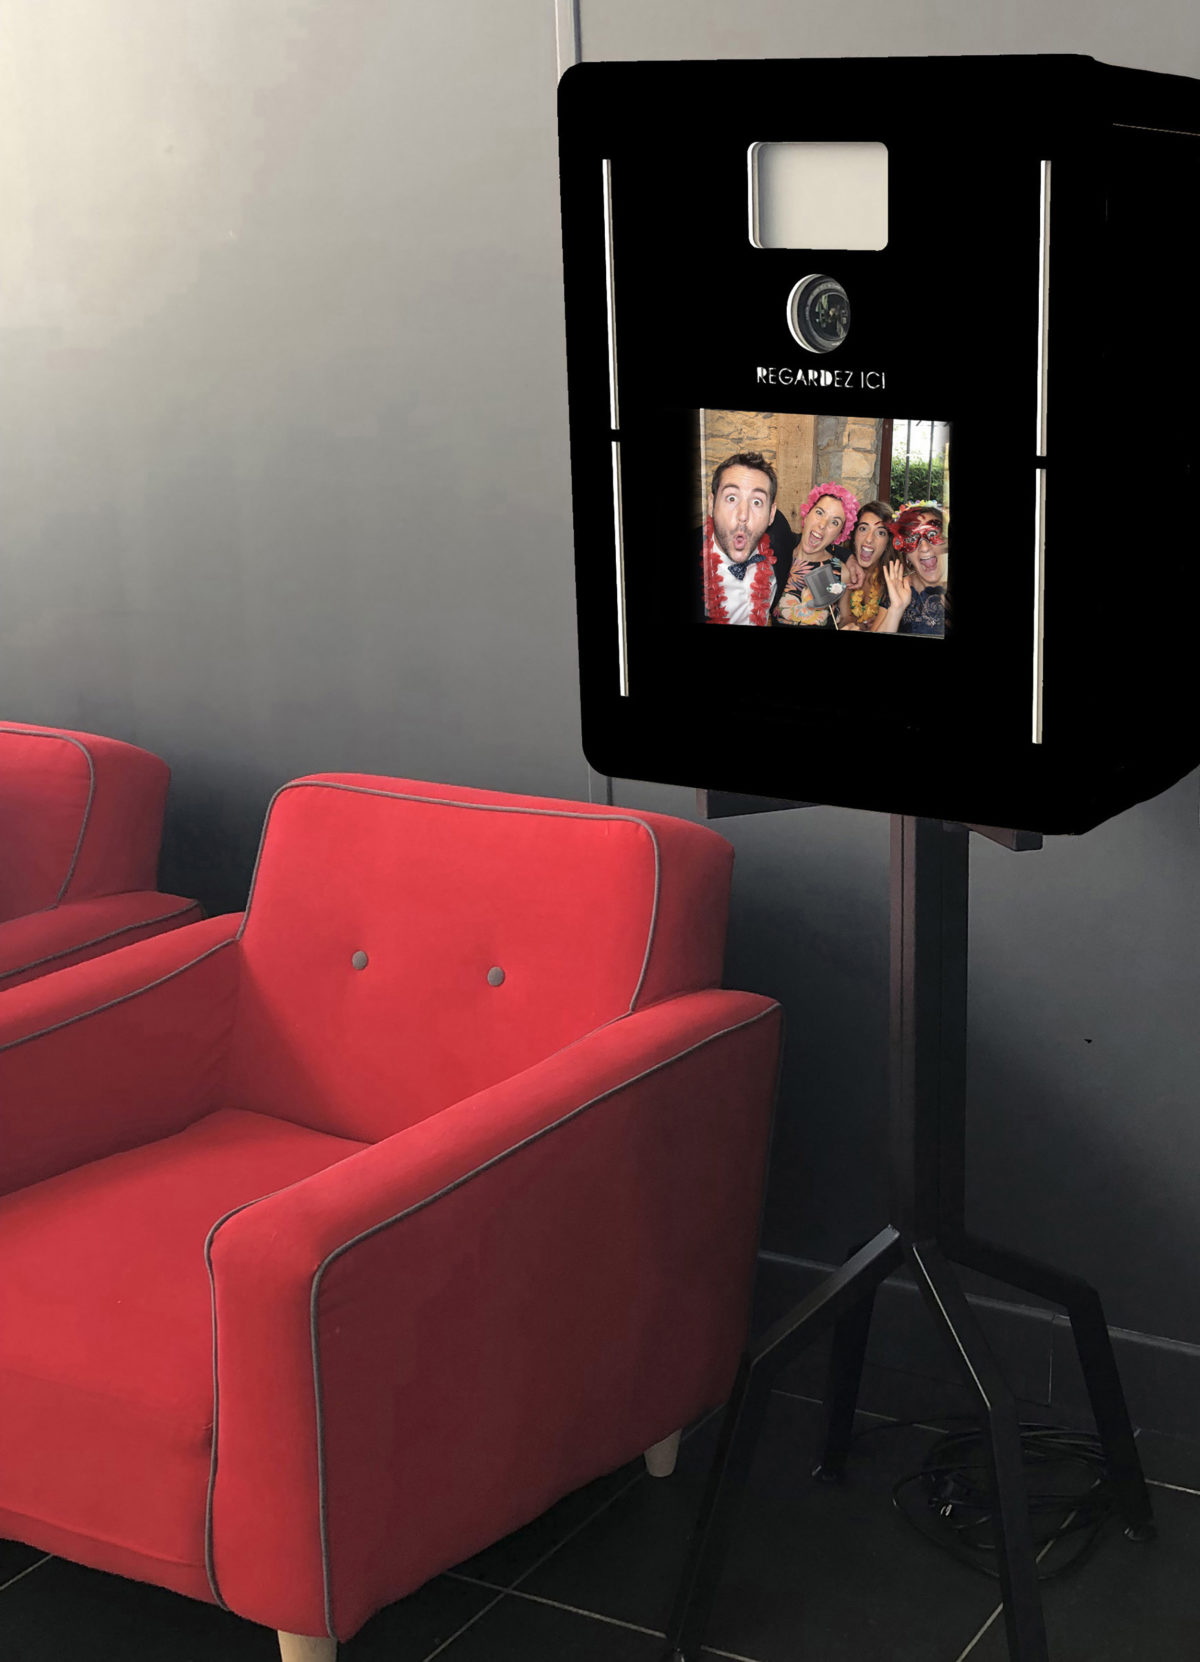 Stéphane Amelinck | Location borne photobooth